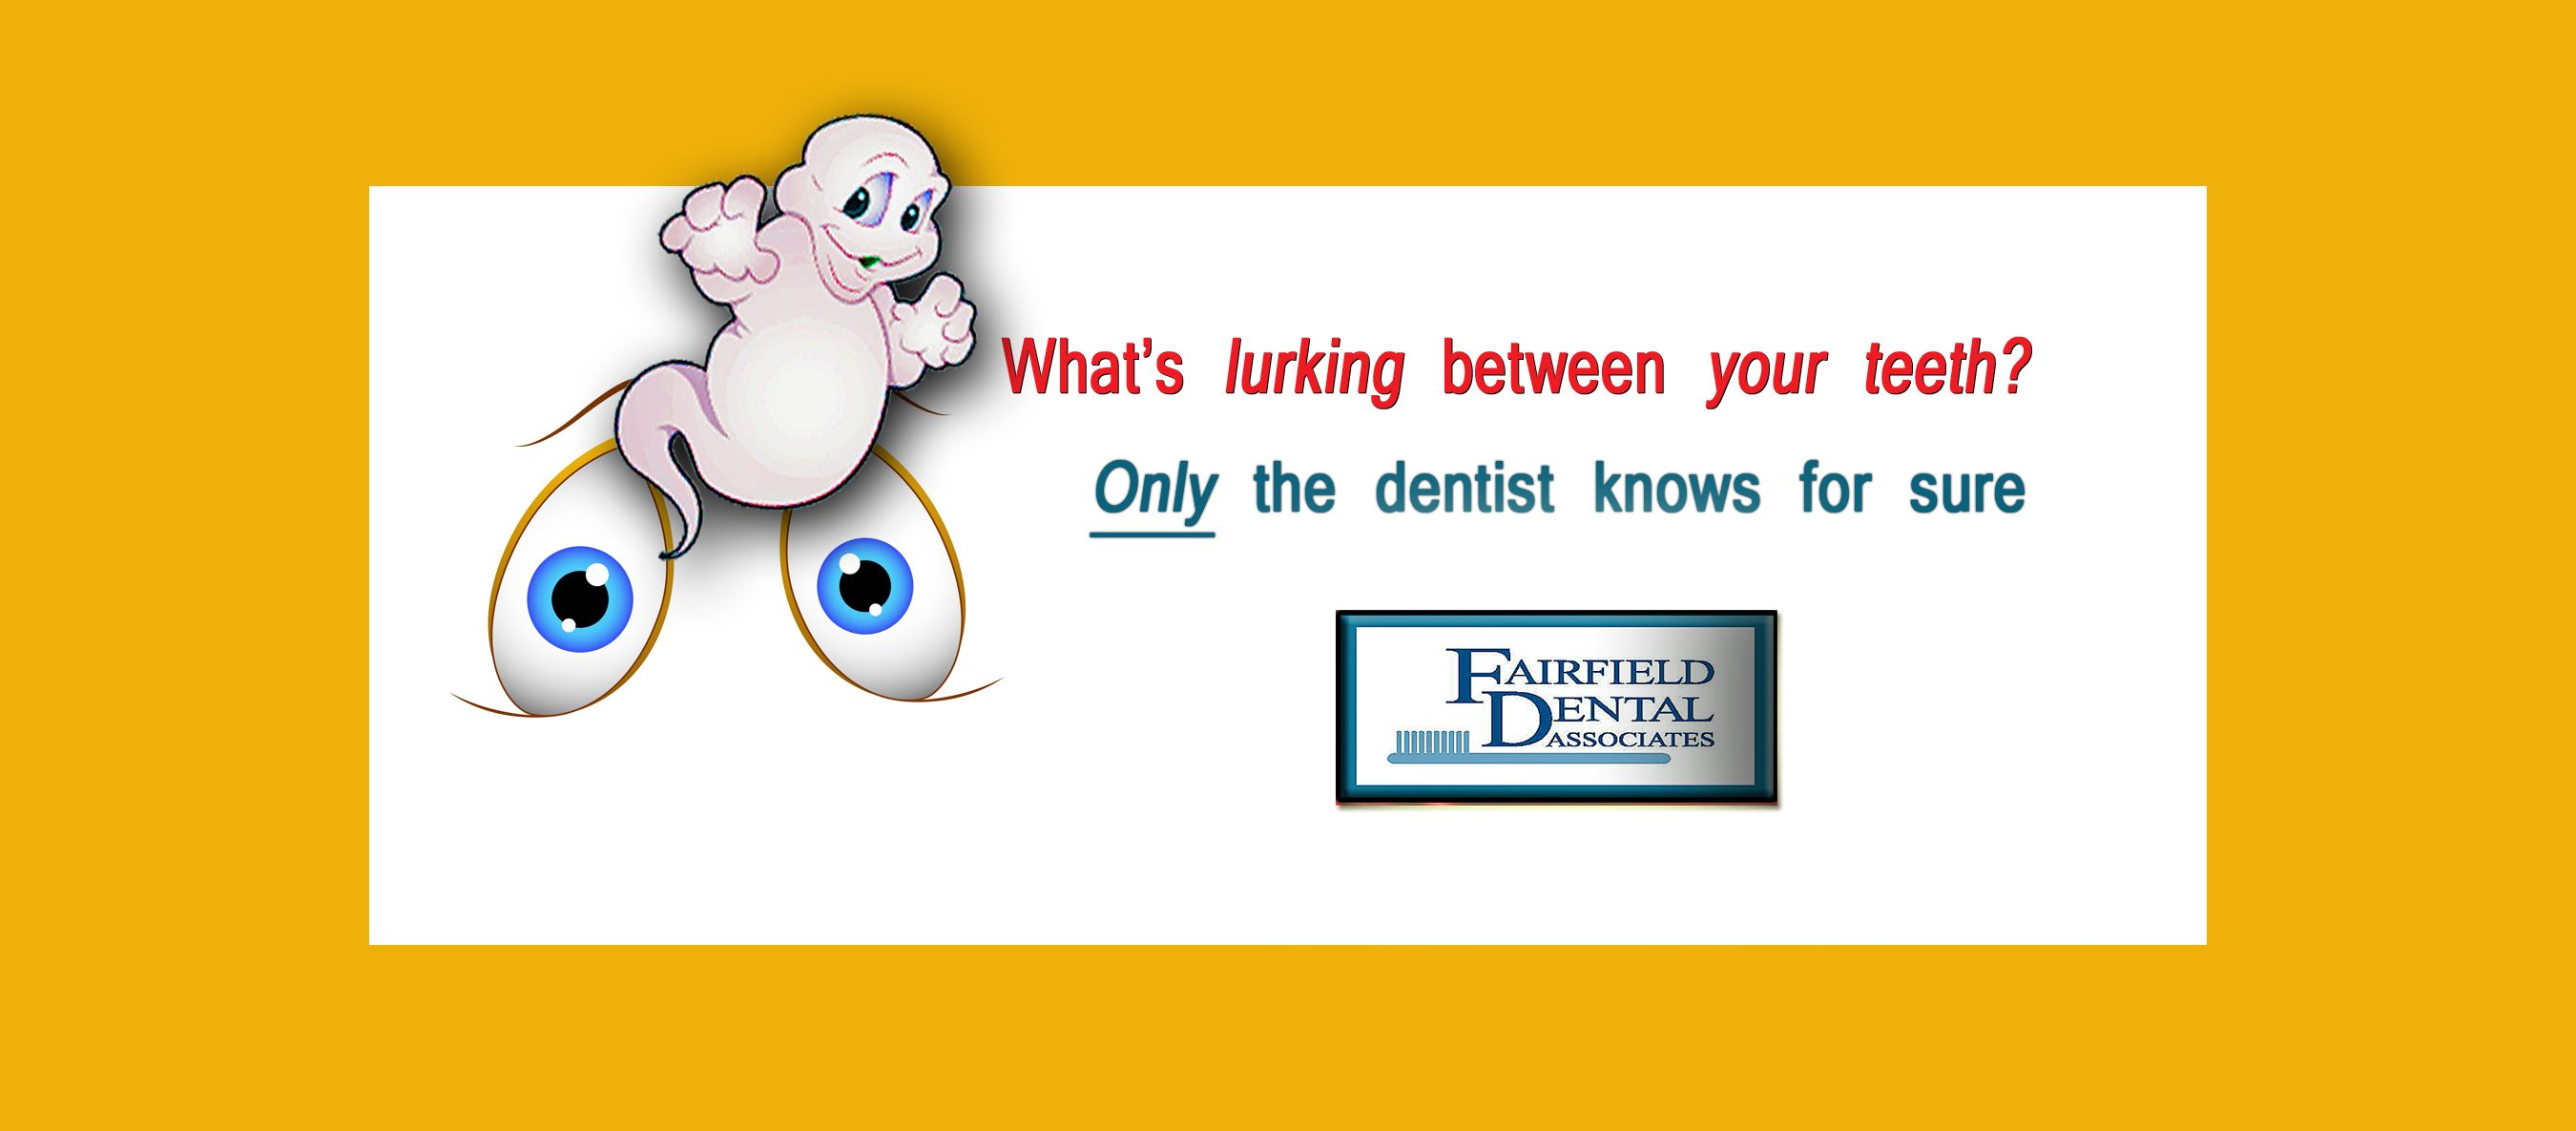 Daily oral hygiene is not enough! You need a dentist like Fairfield Dental Associates to stop cavities http://www.fairfielddentalassociates.com/preventive-care